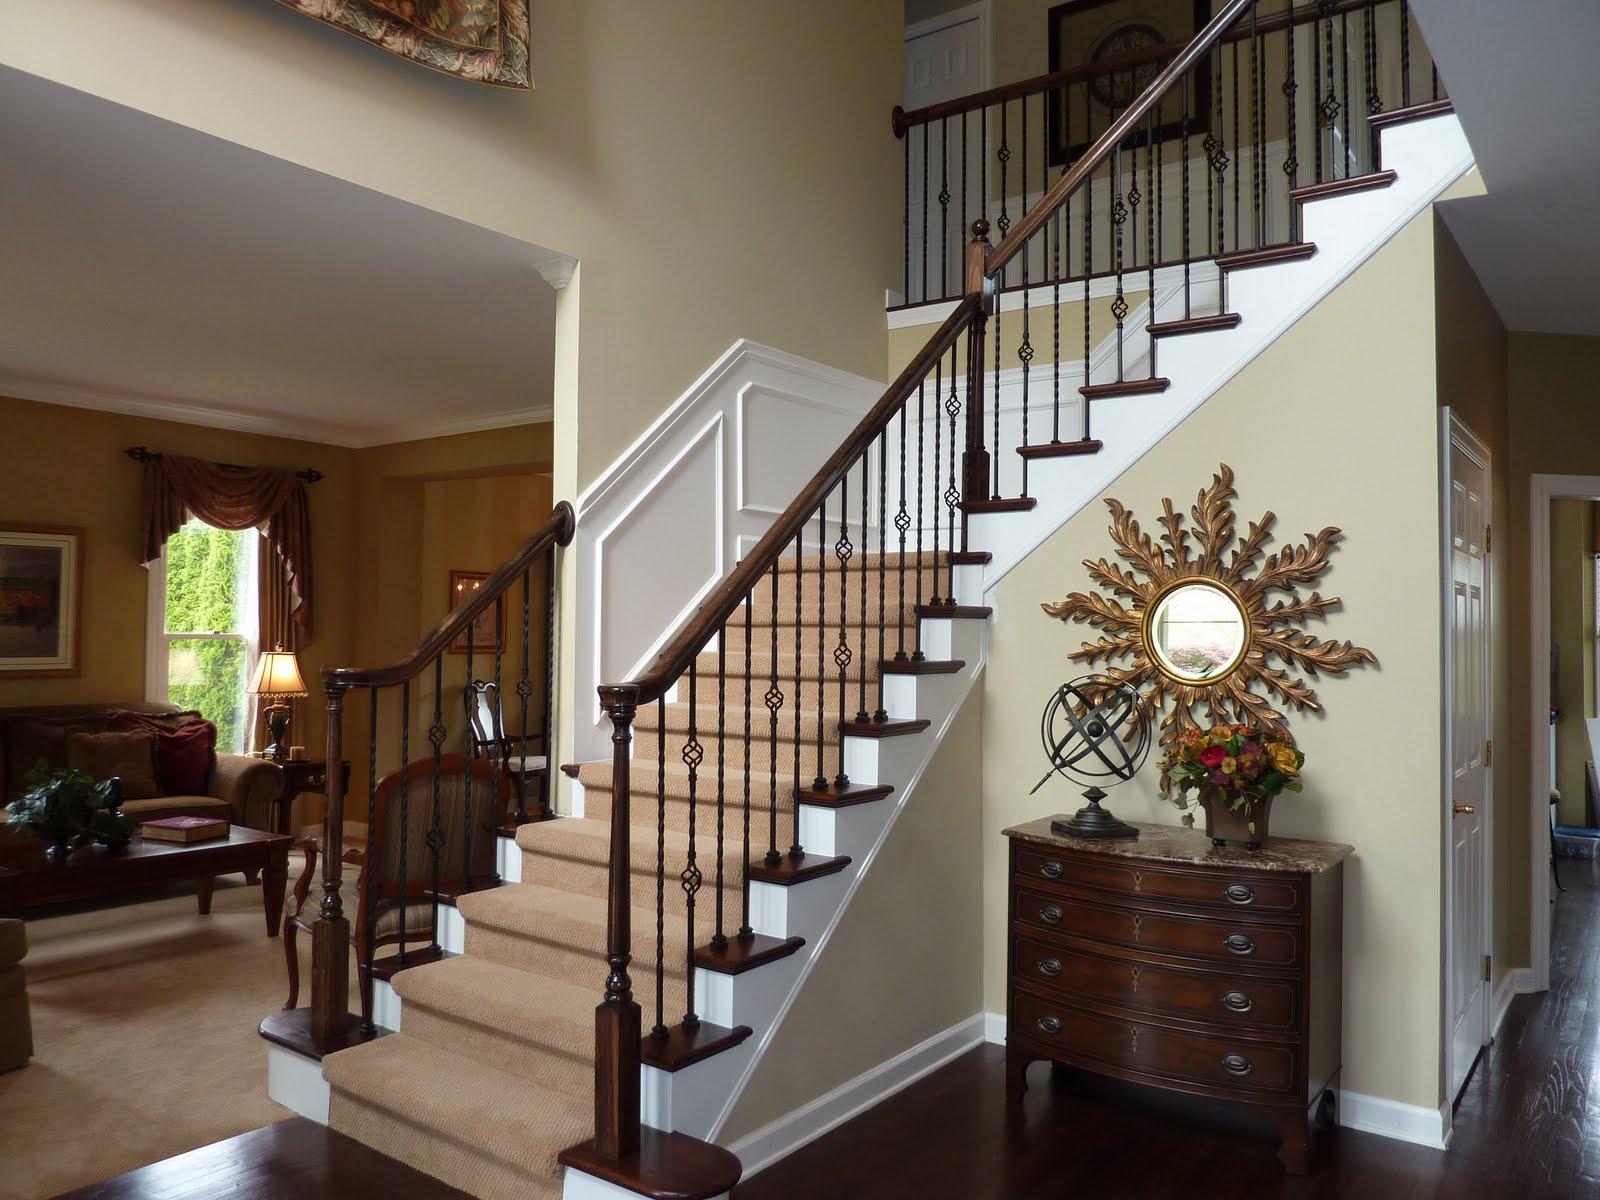 CASHING IN ON REAL ESTATE & DESIGN: Elegant Foyer Transformation